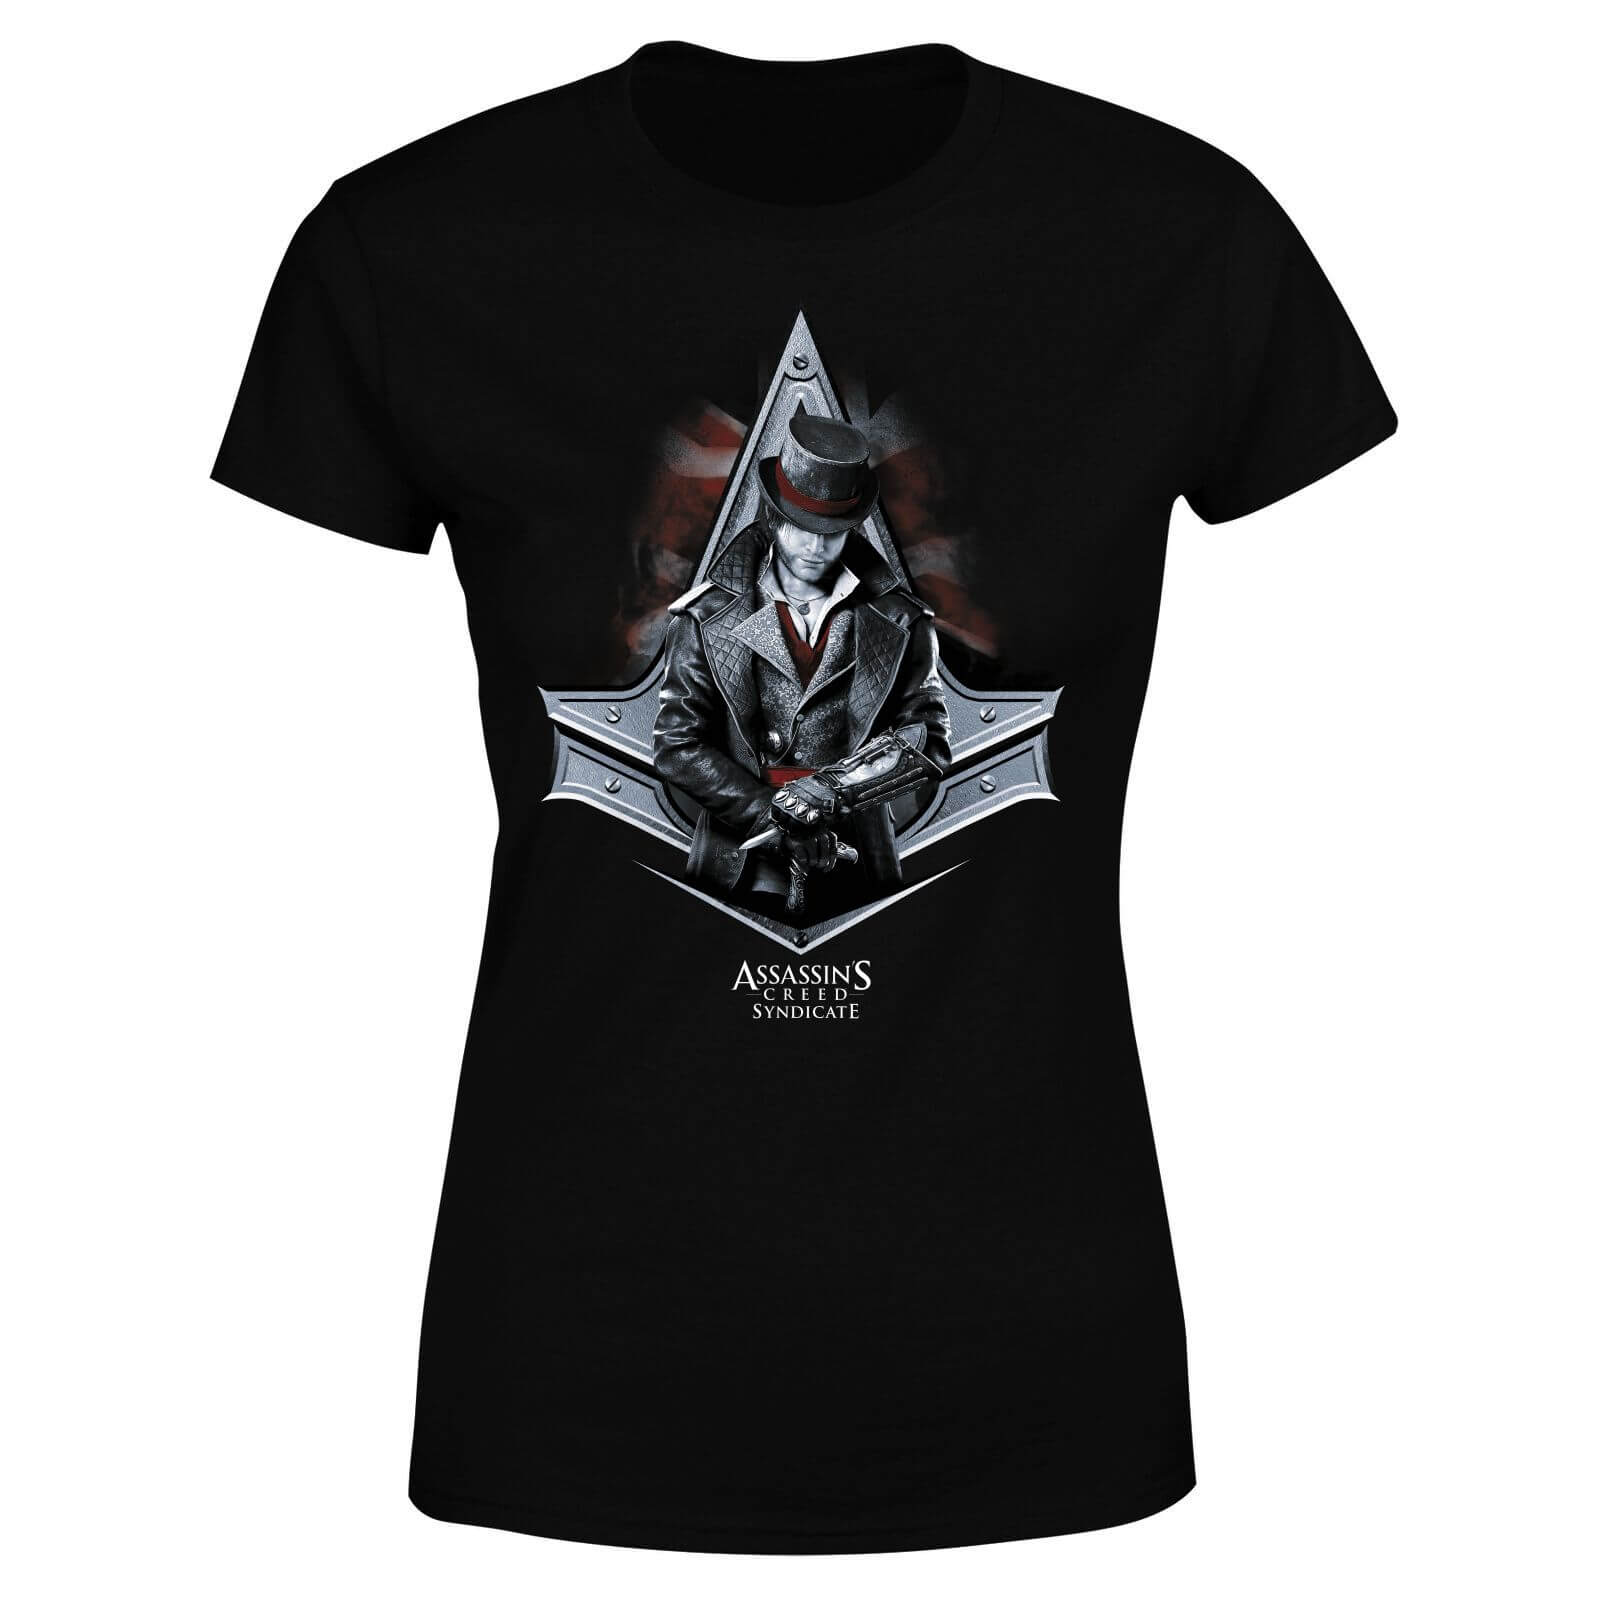 a082e92522 Assassin's Creed Syndicate Jacob Damen T-Shirt - Schwarz | SOWIA